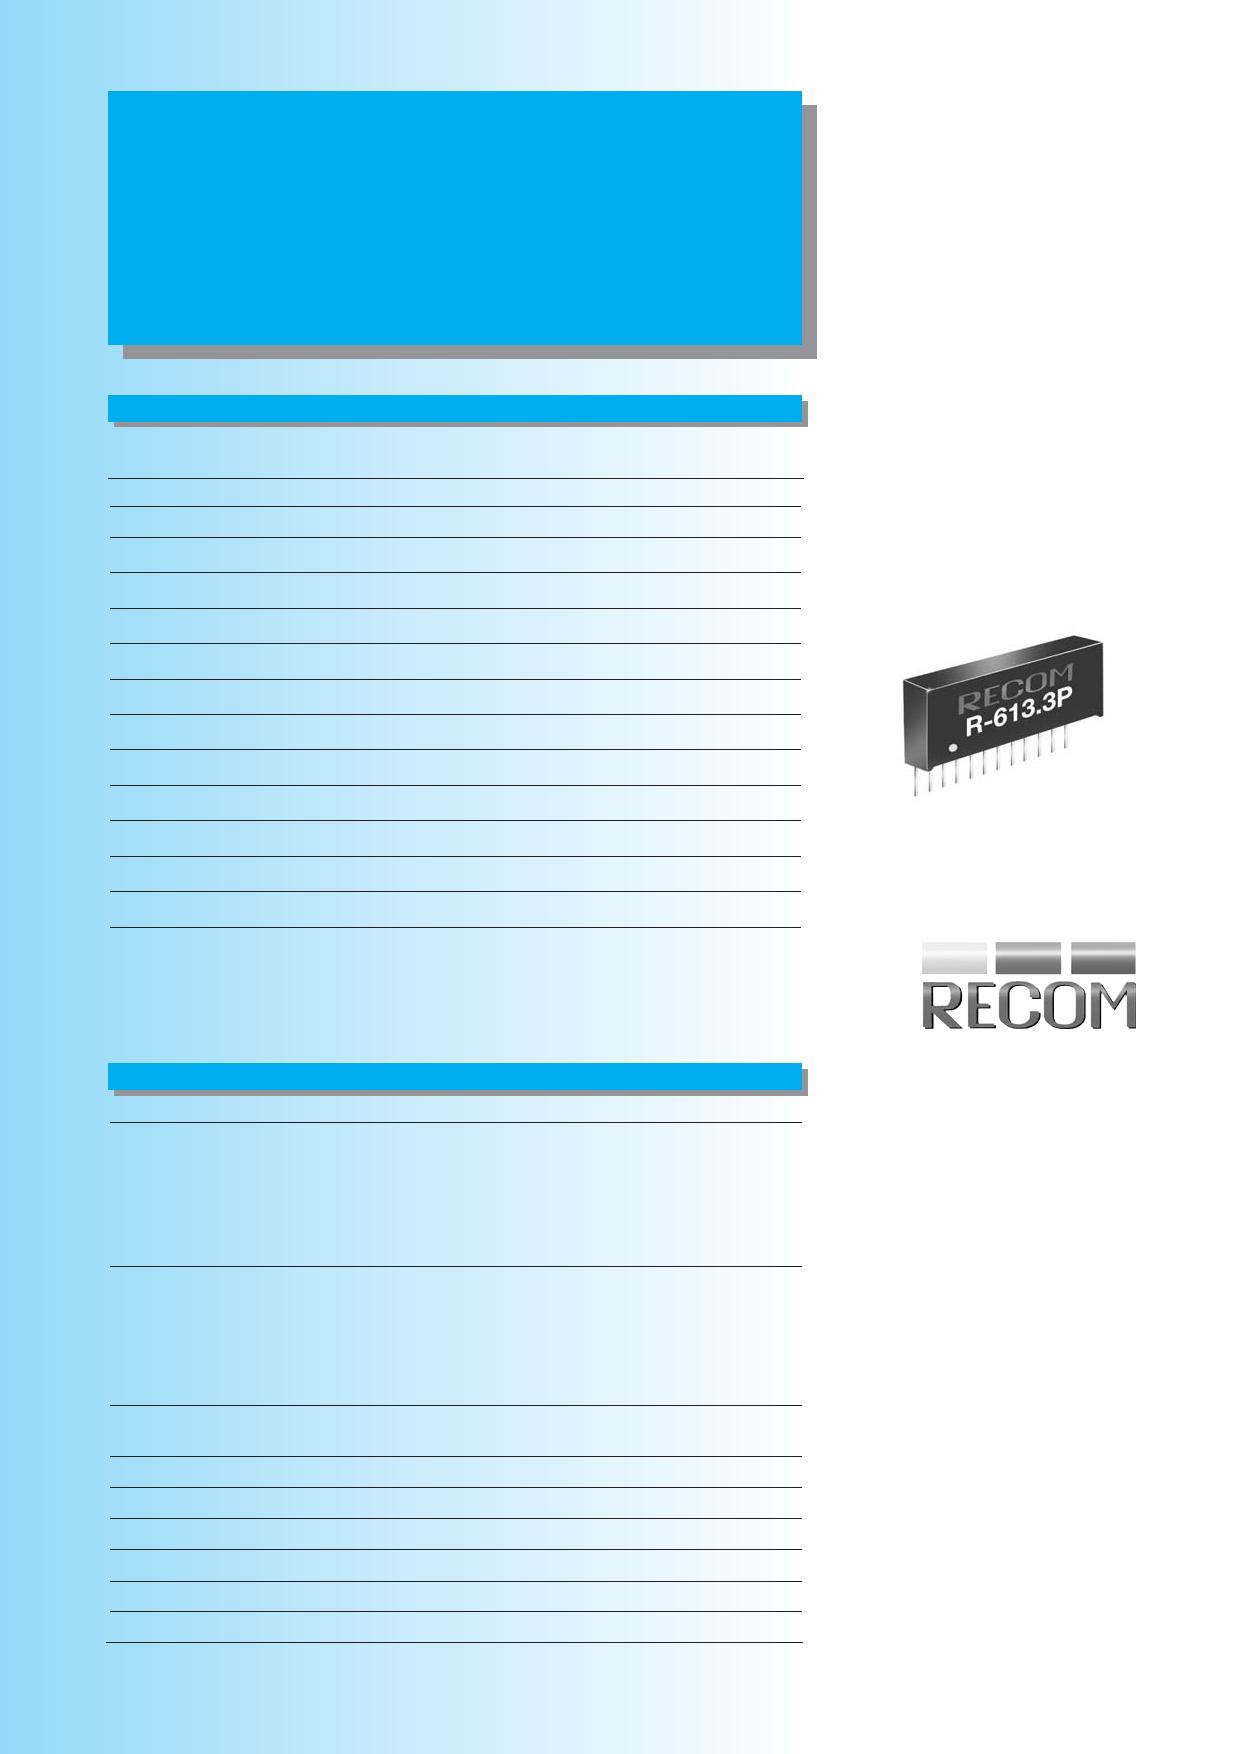 R-6xxxxD datasheet